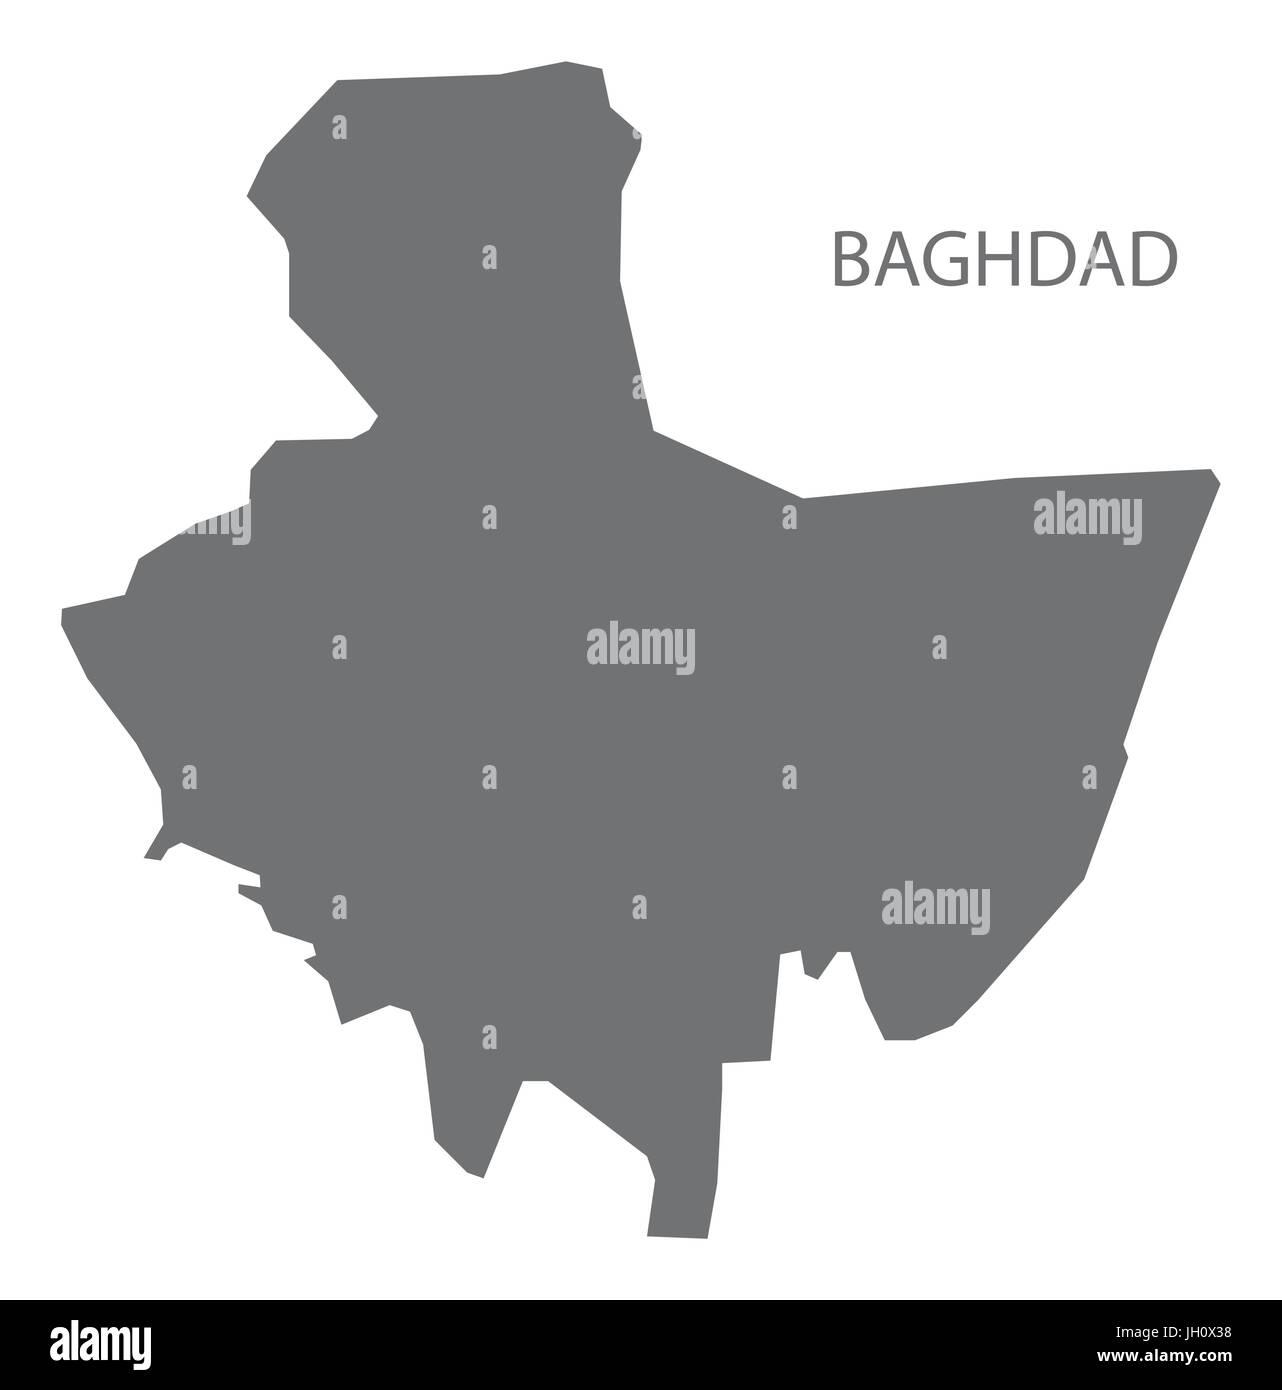 Baghdad Map Stock Photos & Baghdad Map Stock Images - Alamy